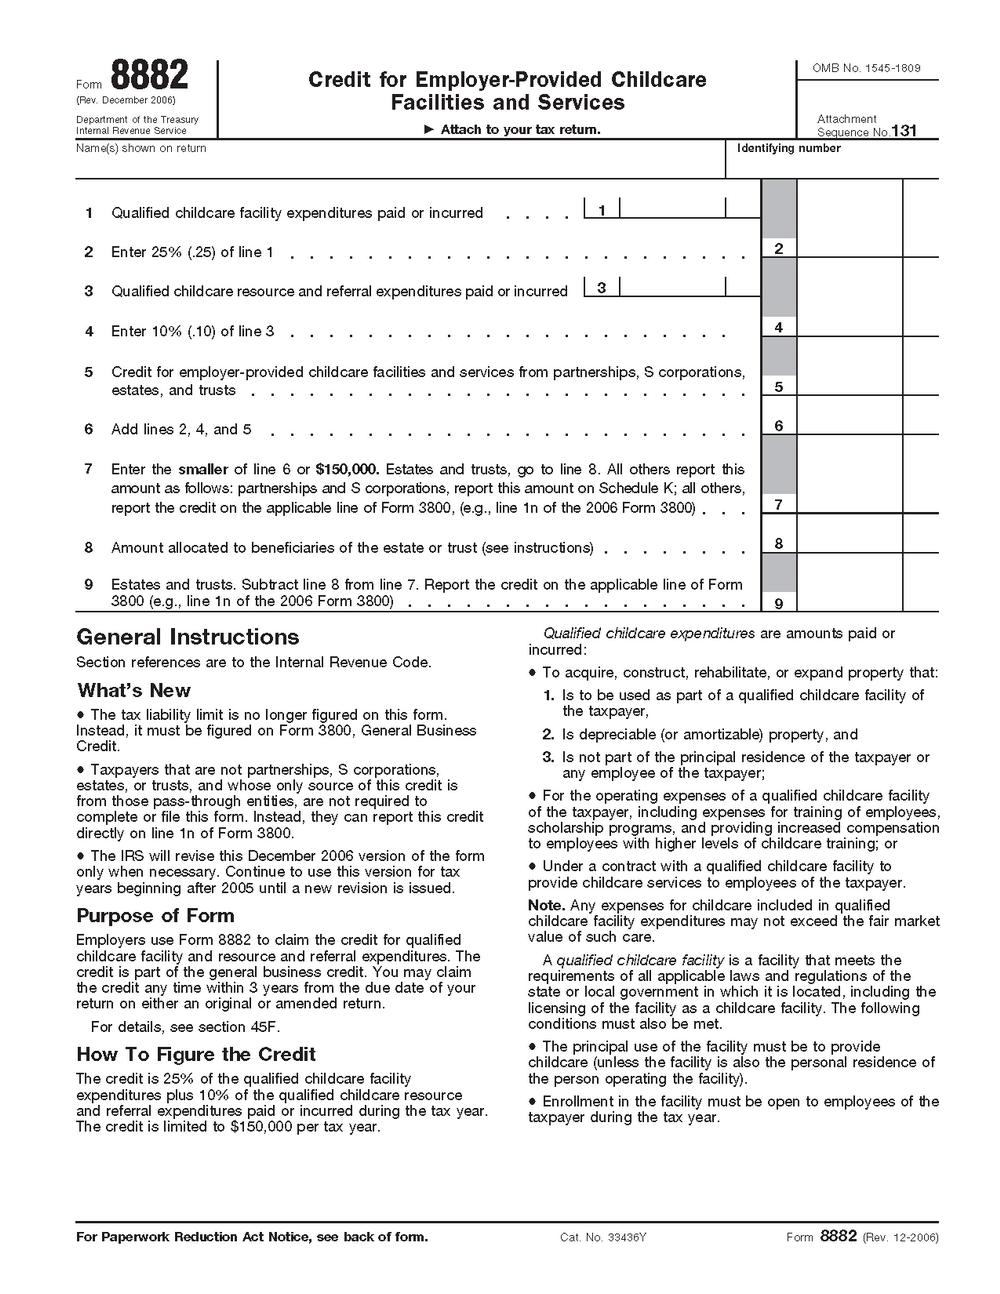 Ohio 1040ez Fillable Form